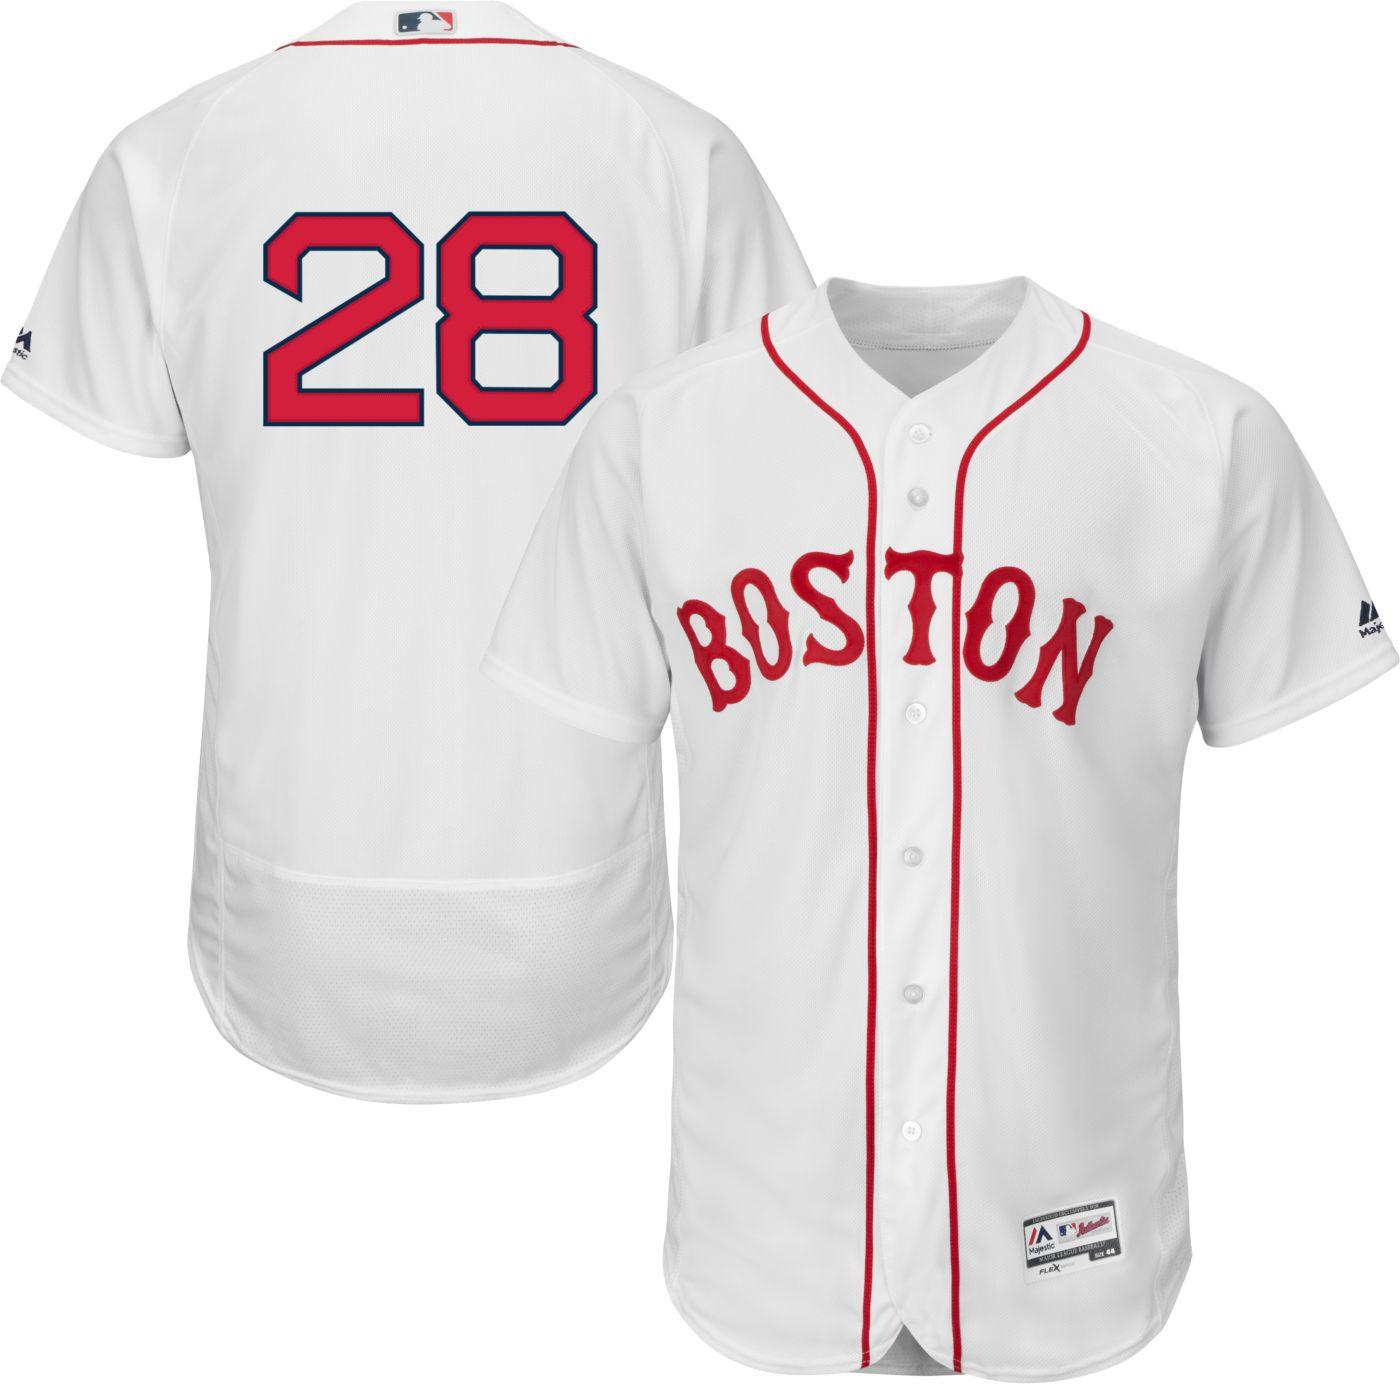 Majestic Men's Authentic Boston Red Sox J.D. Martinez #28 Flex Base Home White On-Field Jersey